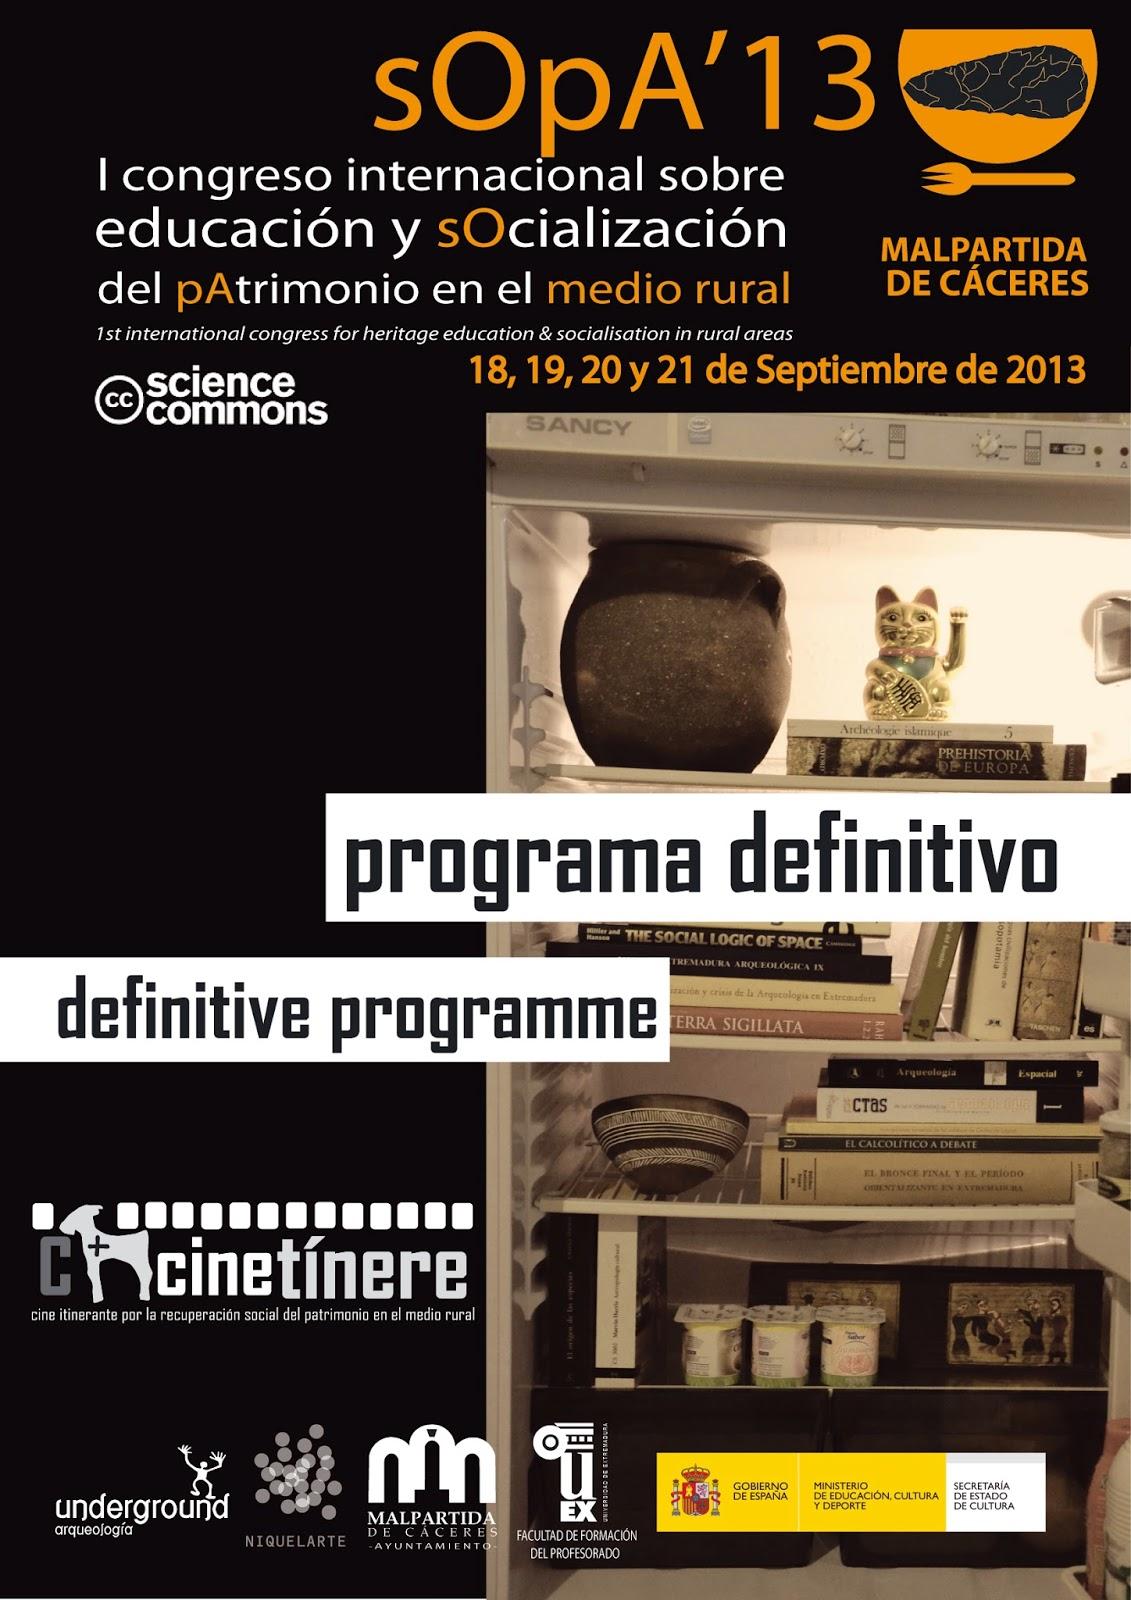 http://issuu.com/sopa13/docs/programa__definitivo_sopa_13